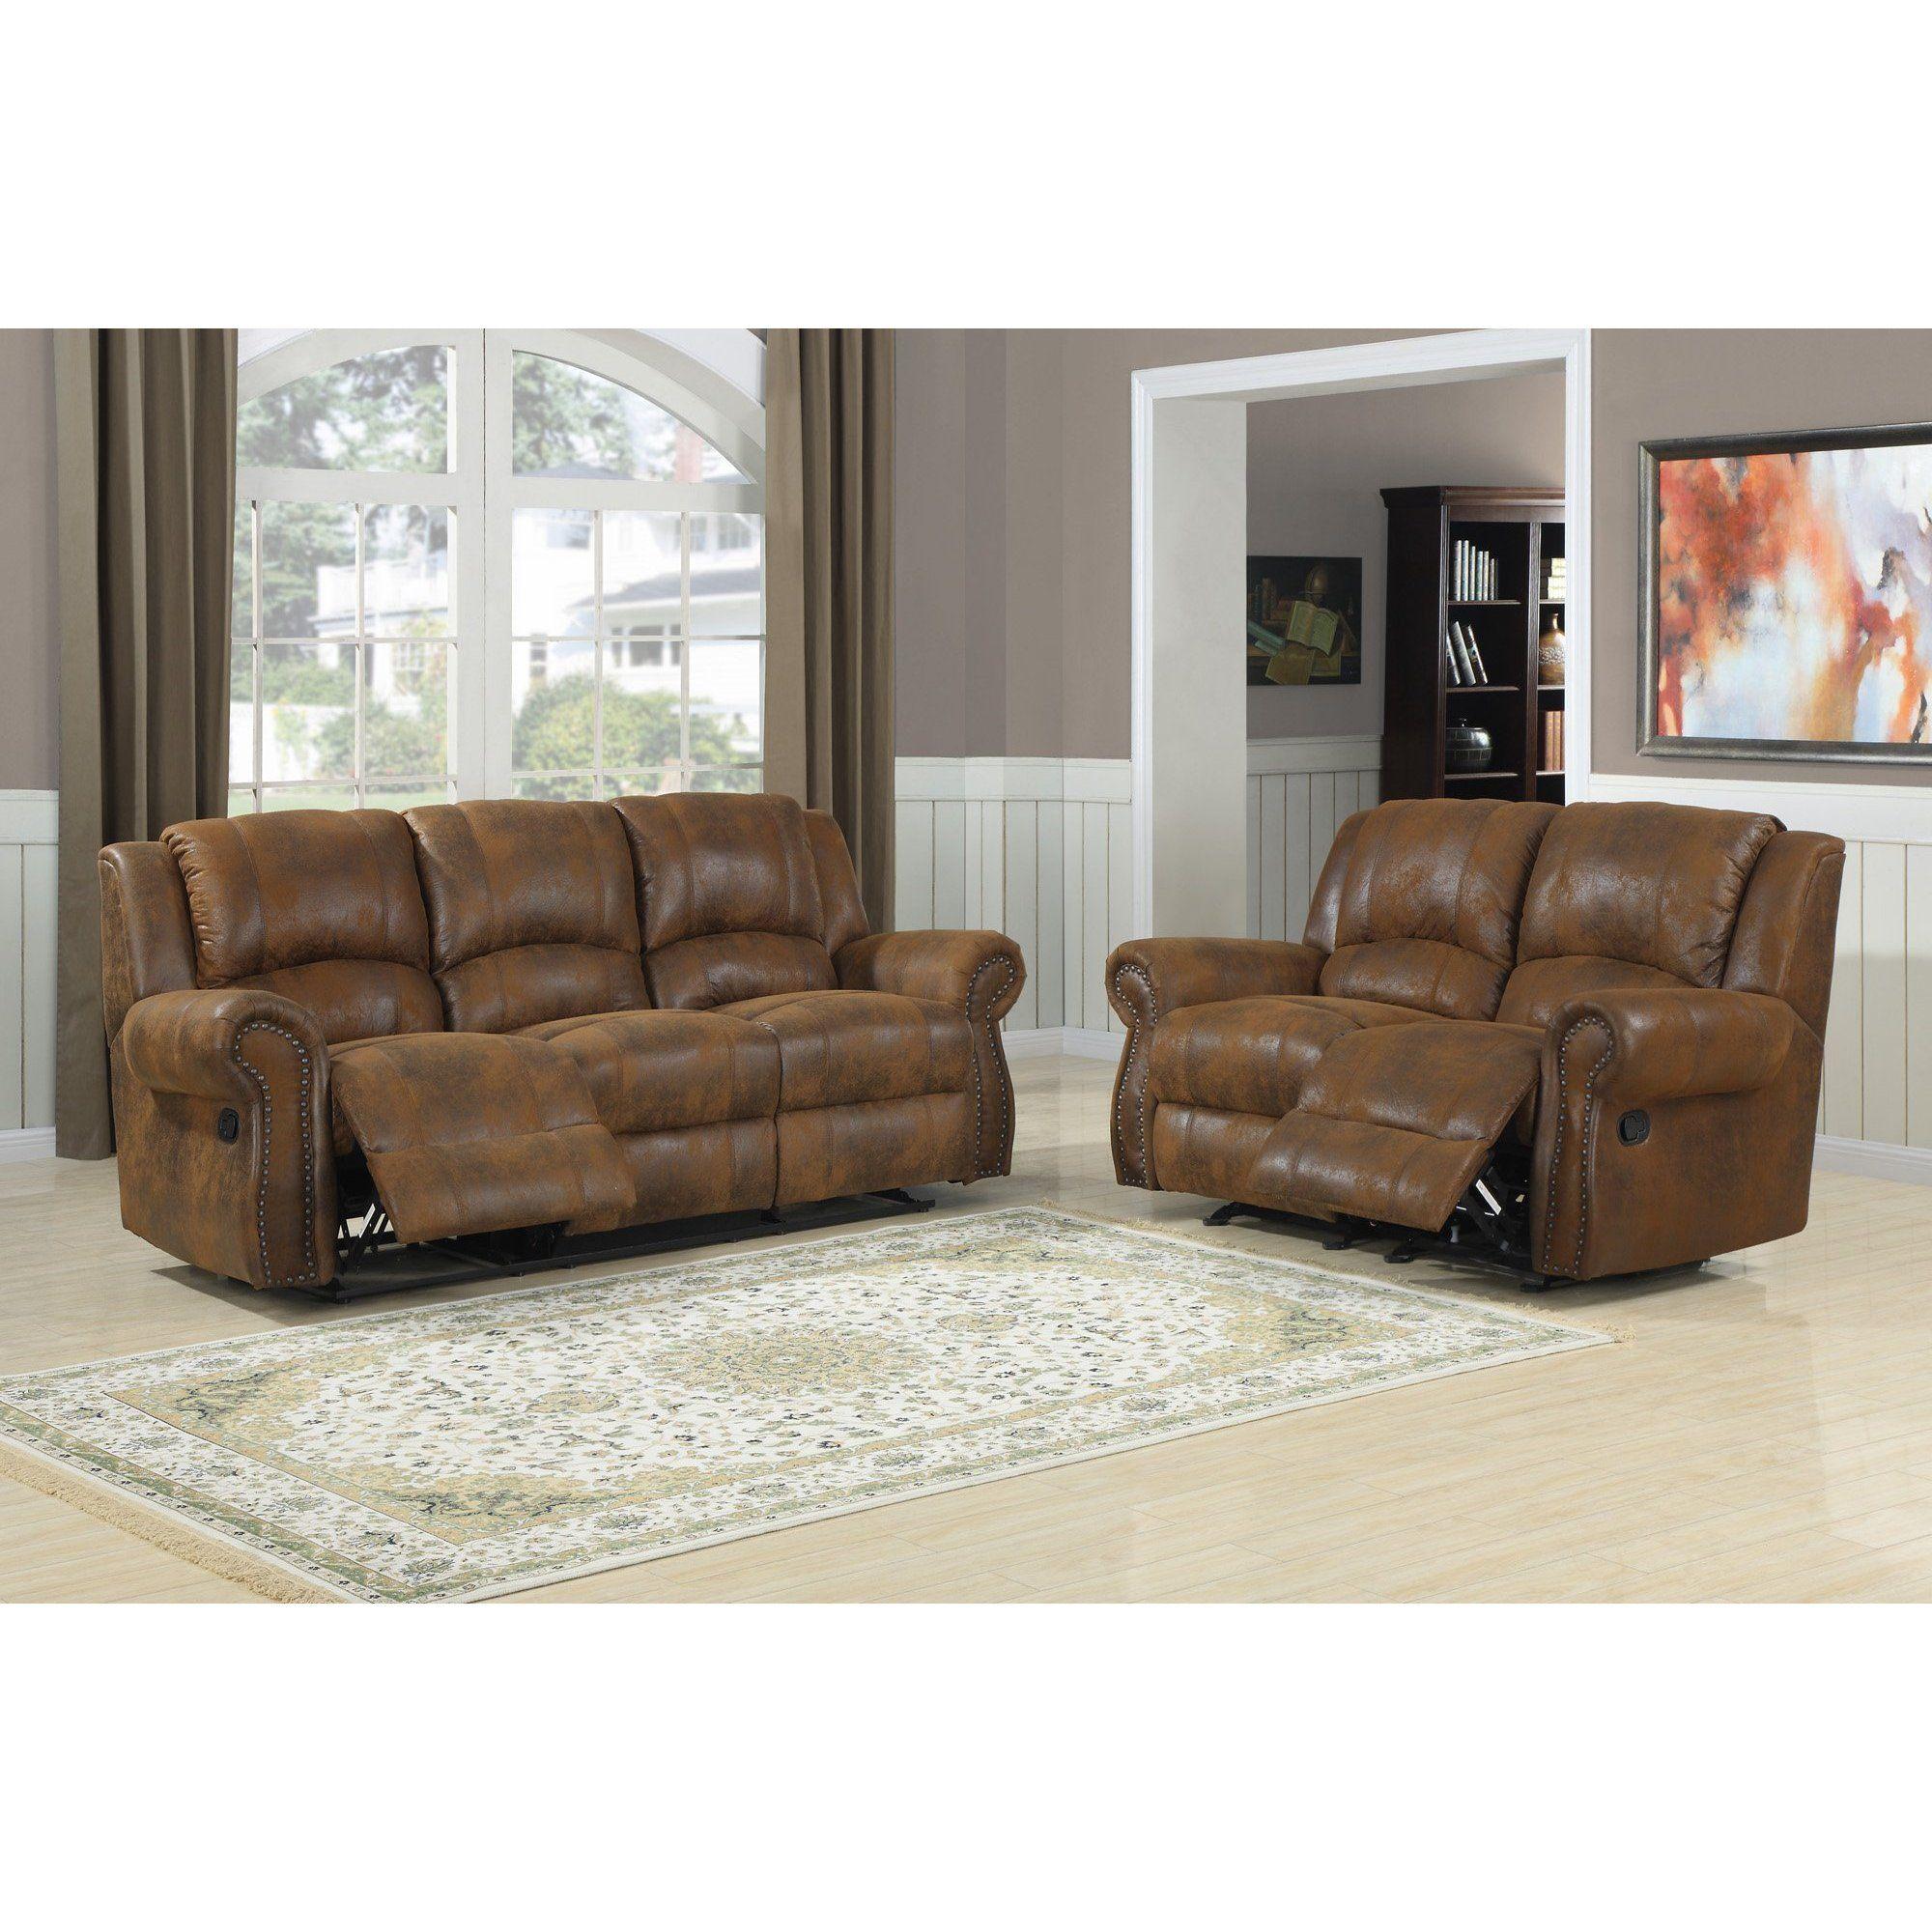 Sofa Pillows FurnitureMaxx Quinn Double Reclining Sofa Bomber Jacket Microfiber Sofas